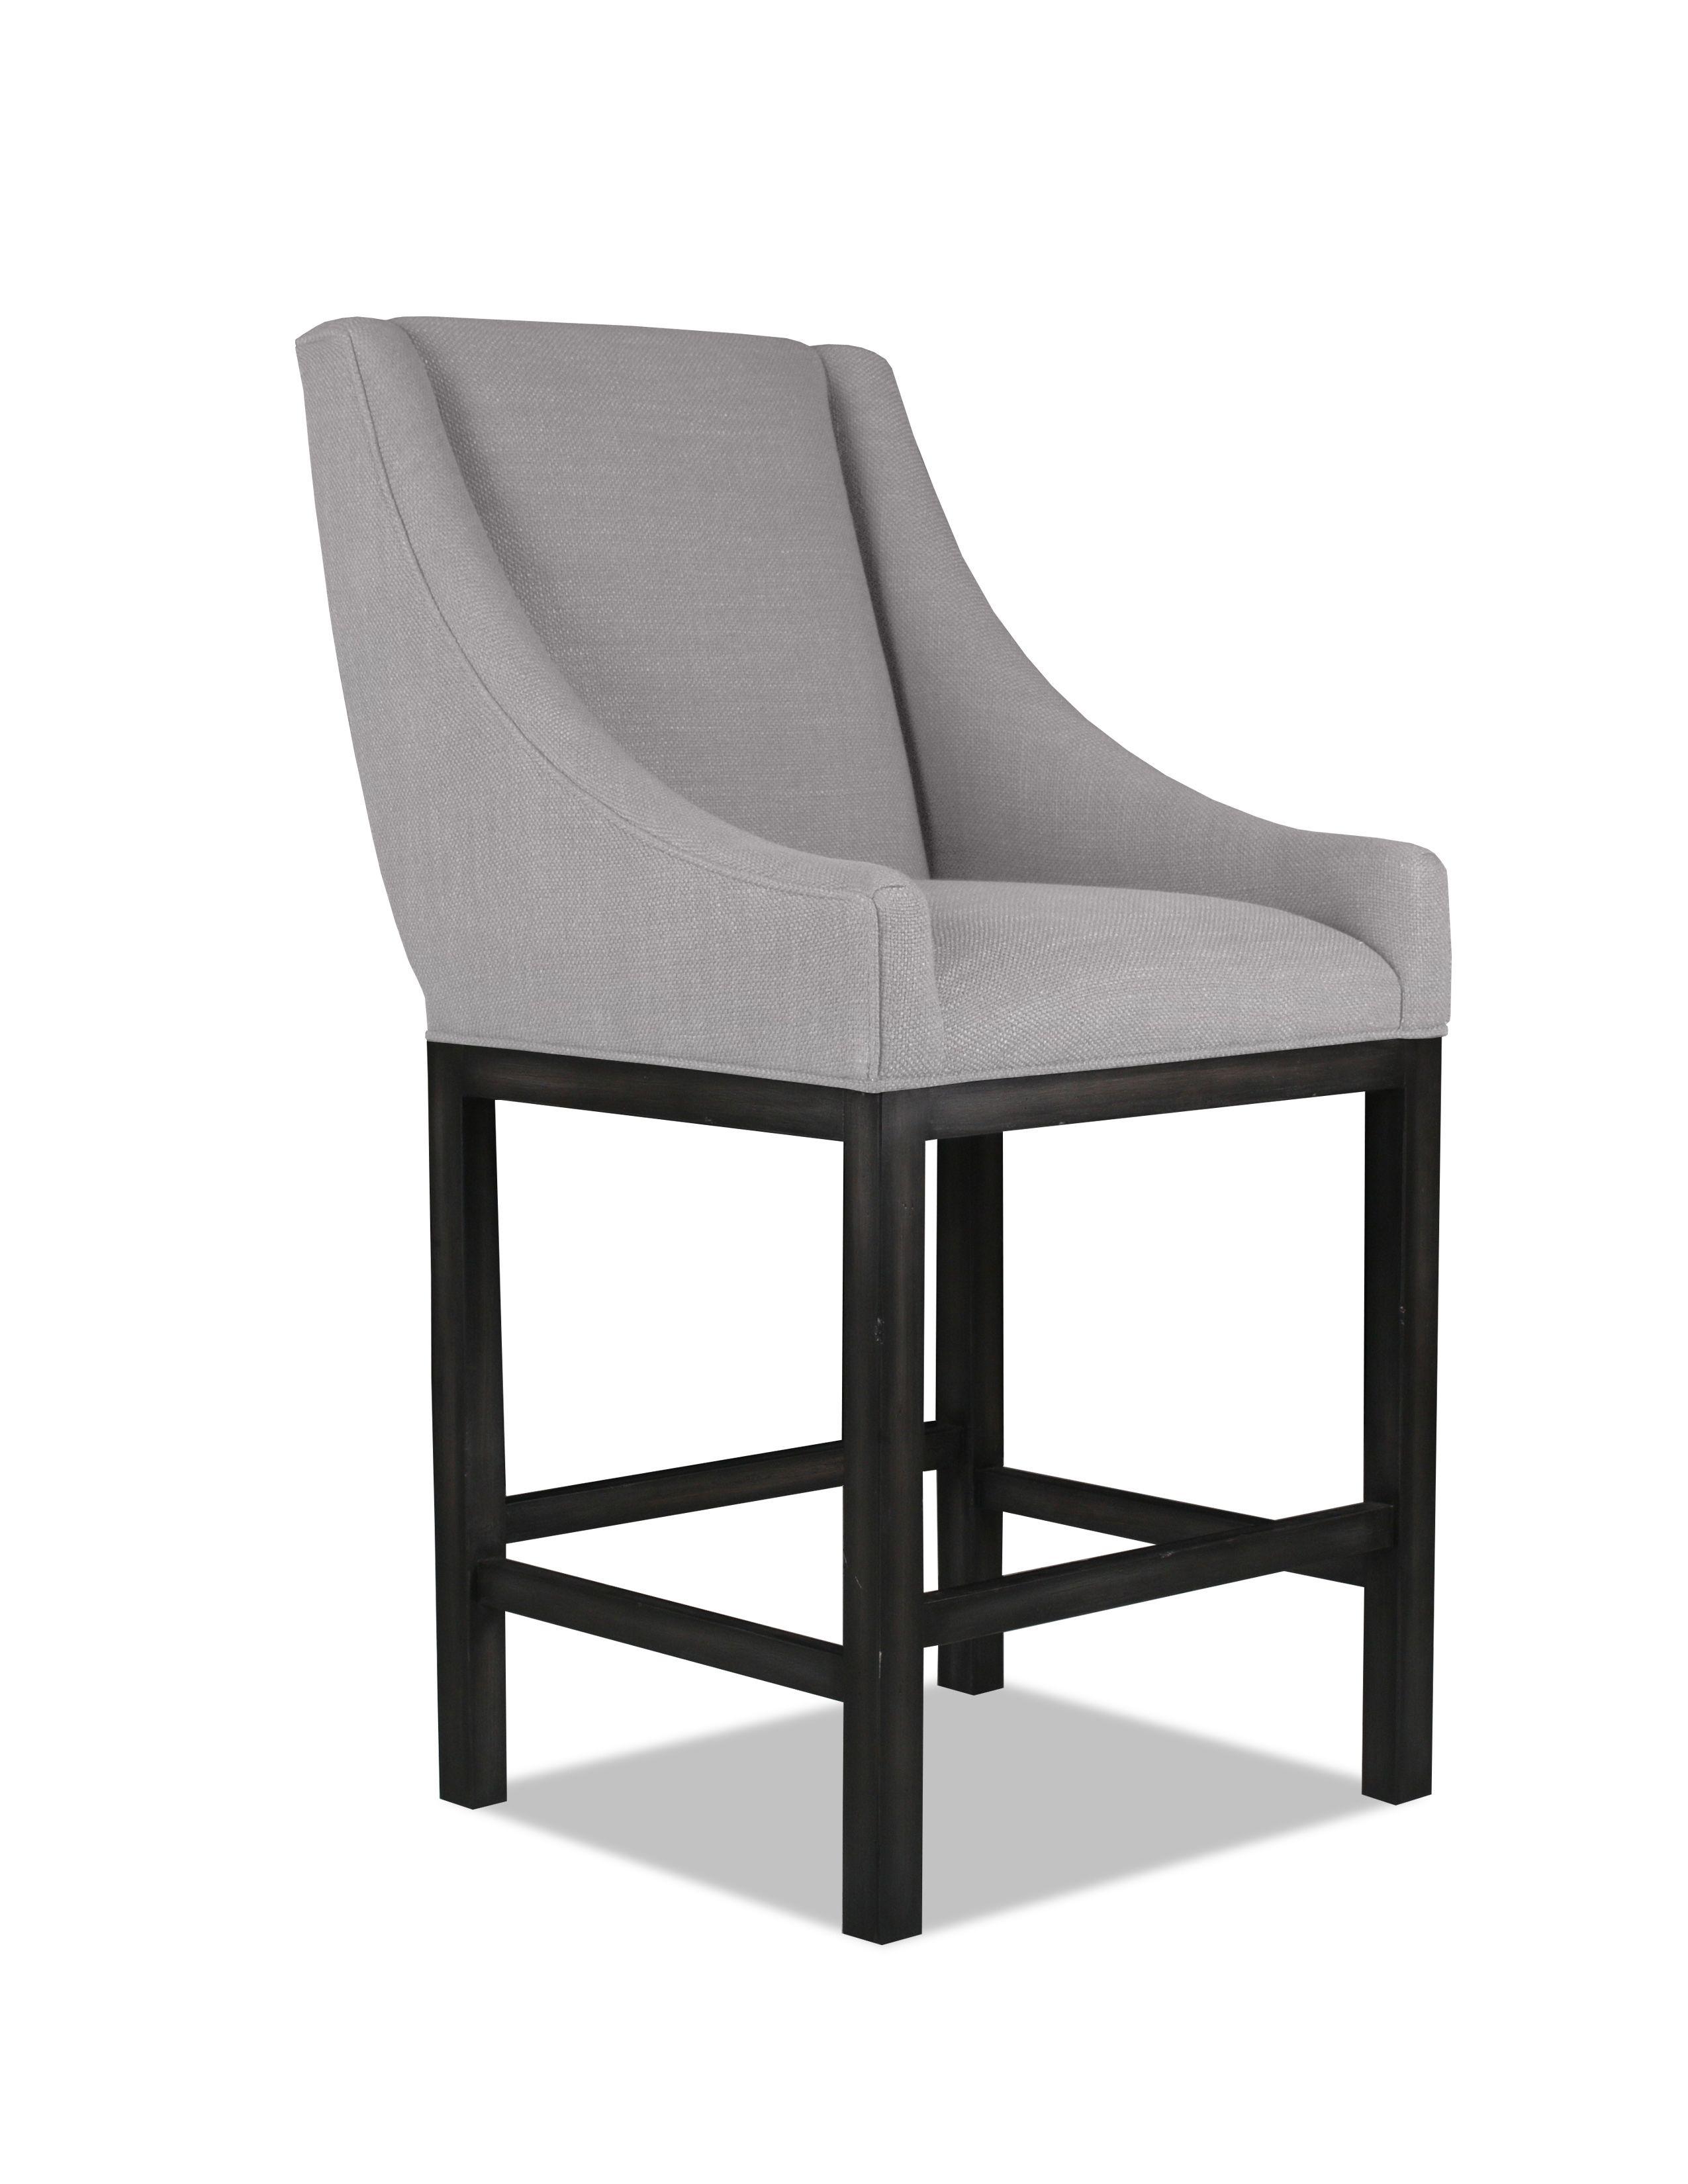 Trento Barstool Bar Stools Counter Stools Furniture